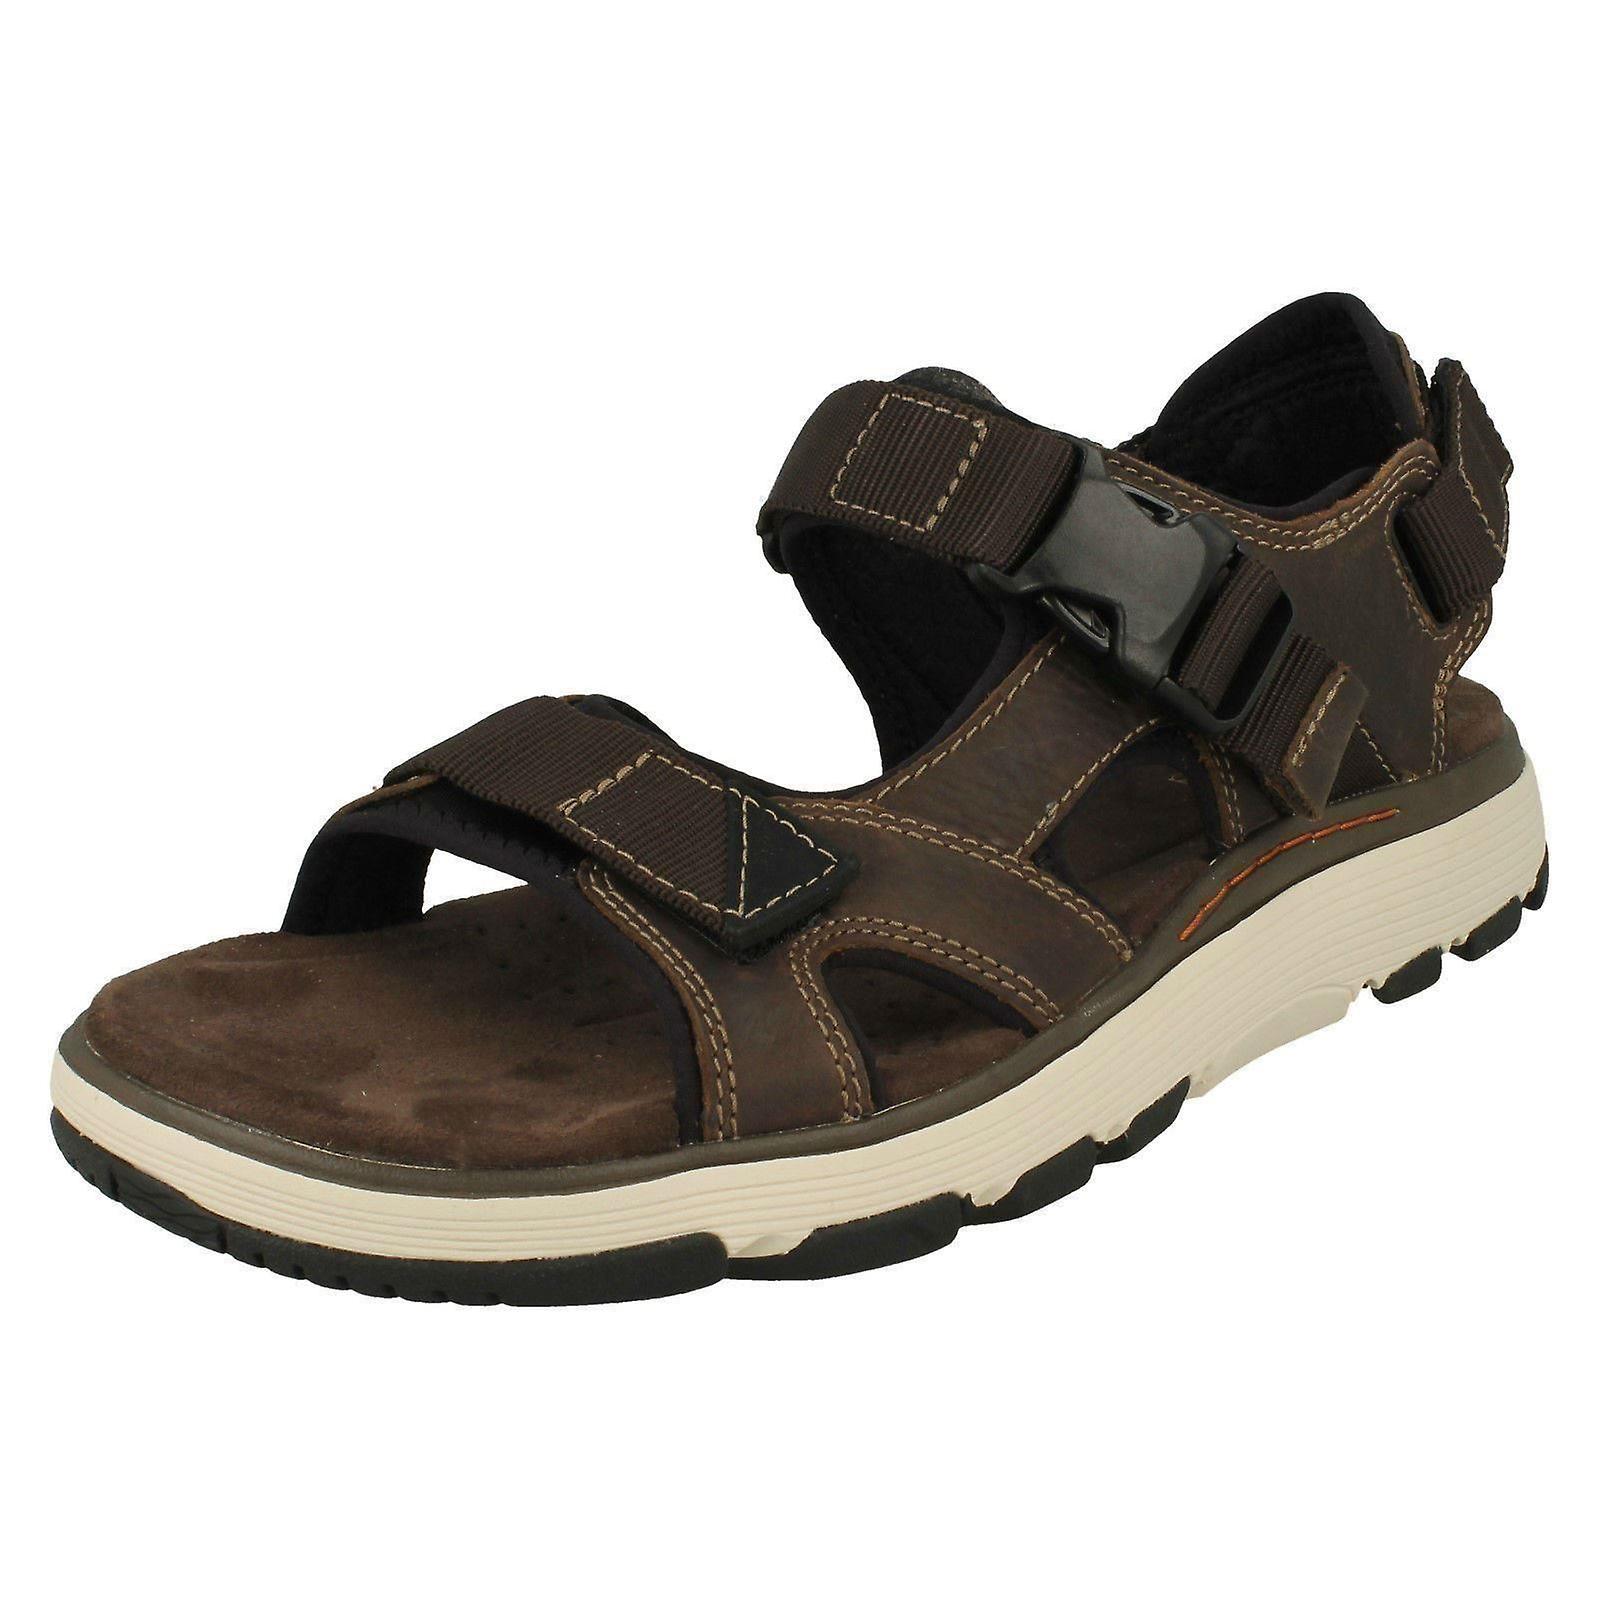 Discounter klassische Schuhe Online bestellen Herren Clarks geschnallt Sandalen Un Trek Bar - Olive Nubuk - UK 10,5 G -  EU Größe 45 - US Größe 11,5 M